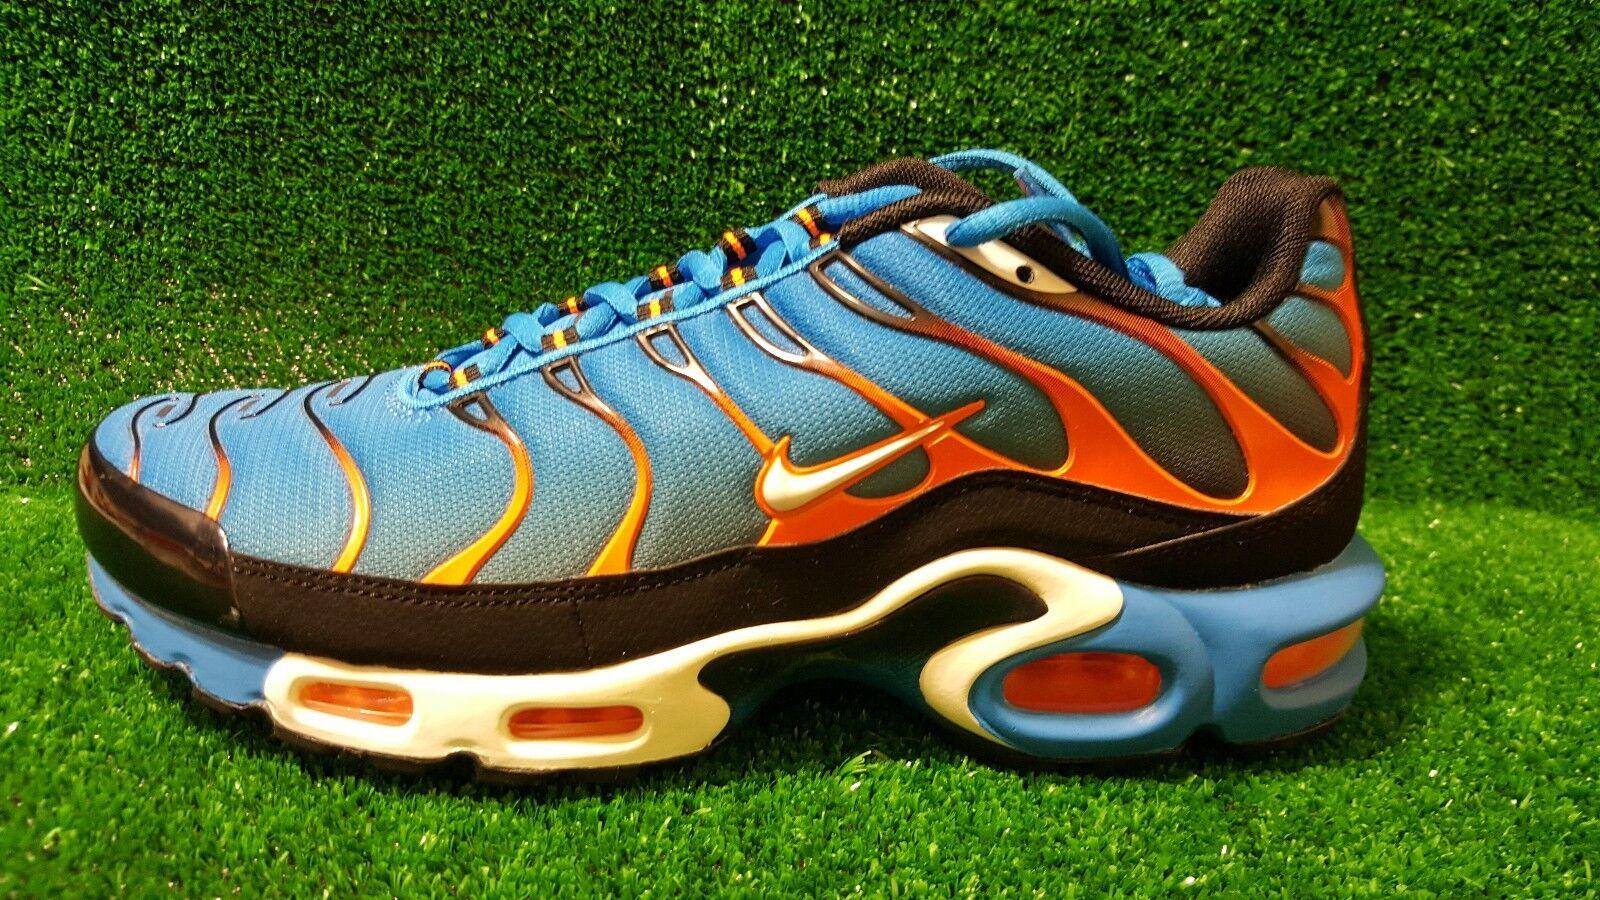 Nike Air Max Plus Tn Tuned 1 852630 Photo Bleu Orange blanc 852630 1 400 Sz us 7-8.5 8108ee